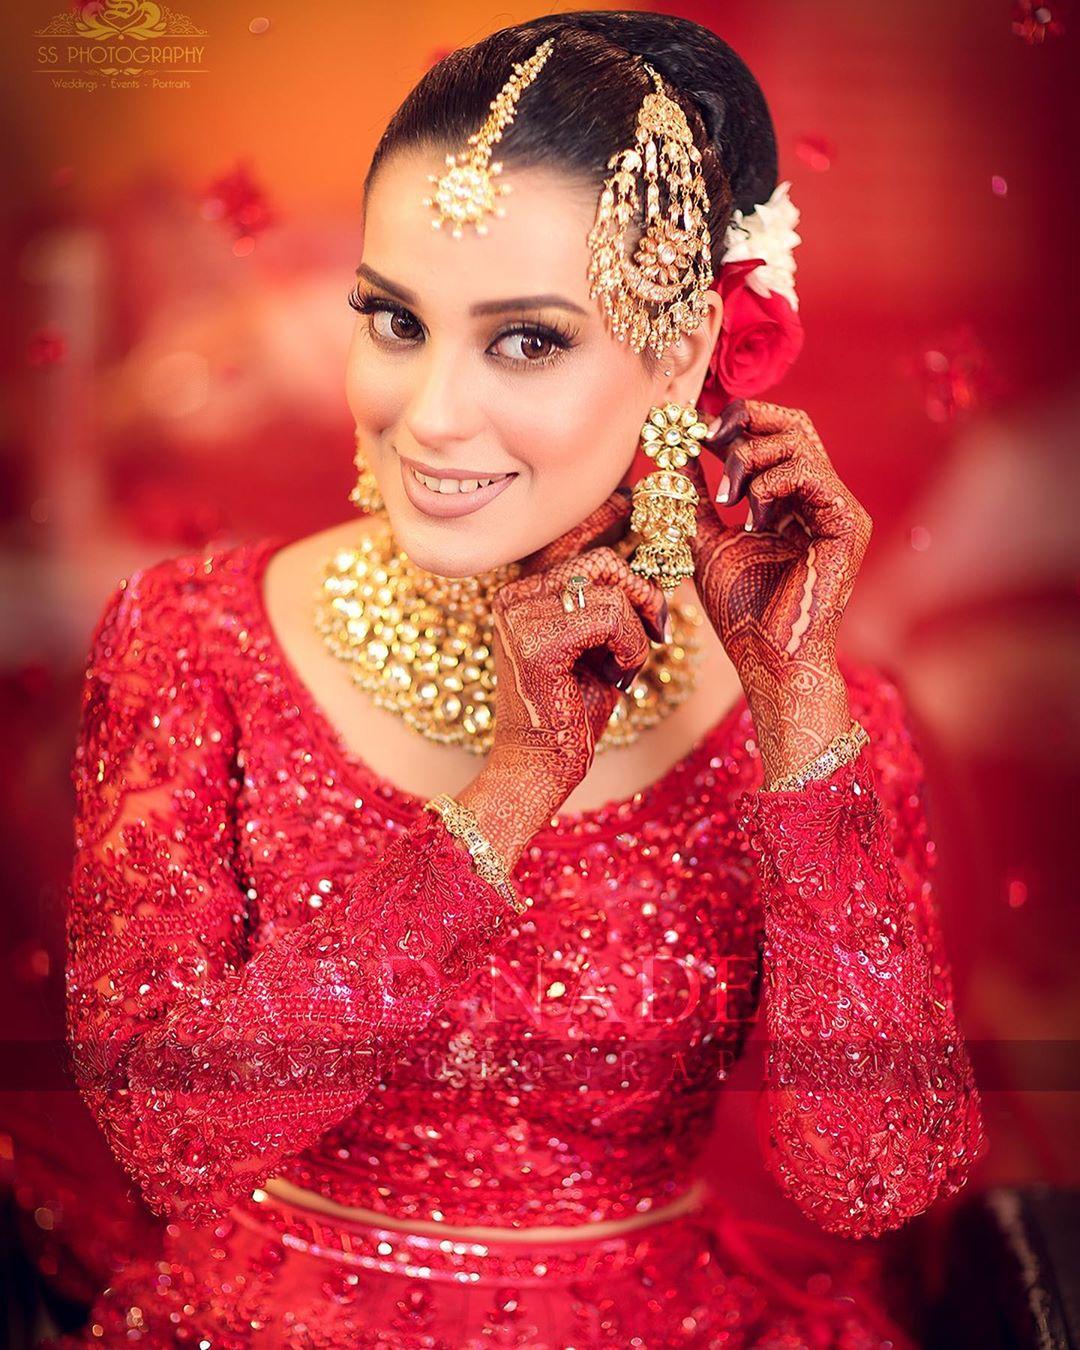 Iqra Aziz and Yasir Hussain Wedding Pictures (8)